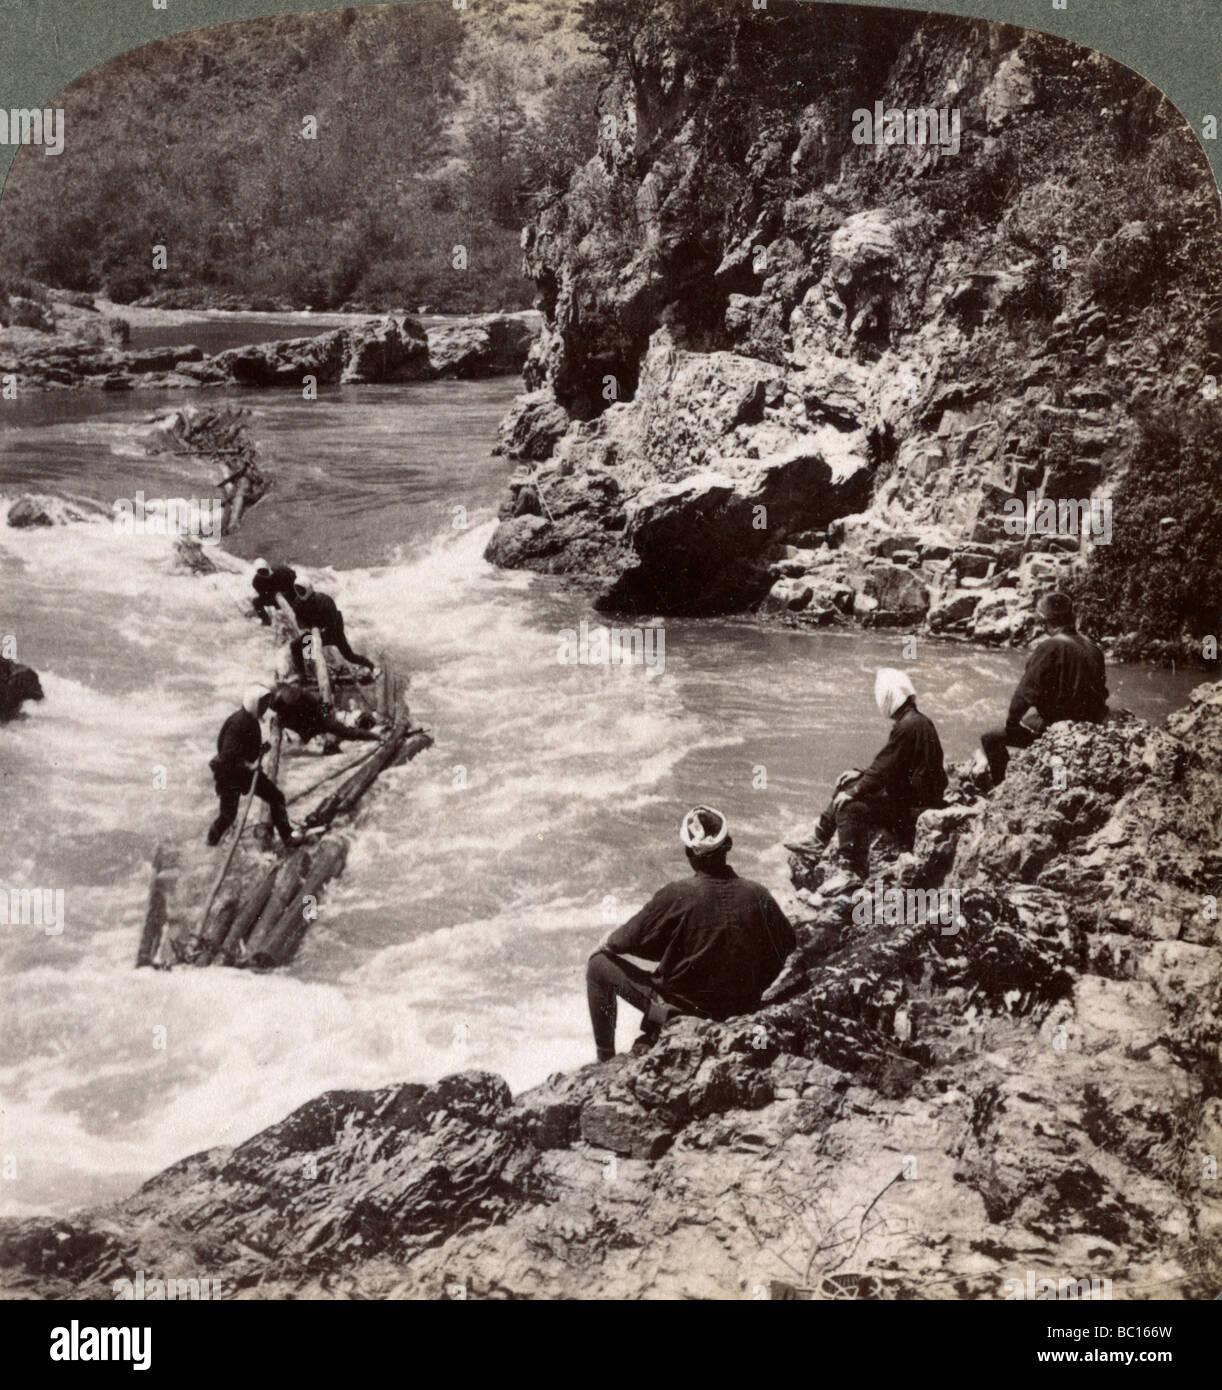 Men on a log raft, shooting the Hozu Rapids on the Katsura River, Kyoto, Japan, 1904. Artist: Underwood & Underwood - Stock Image